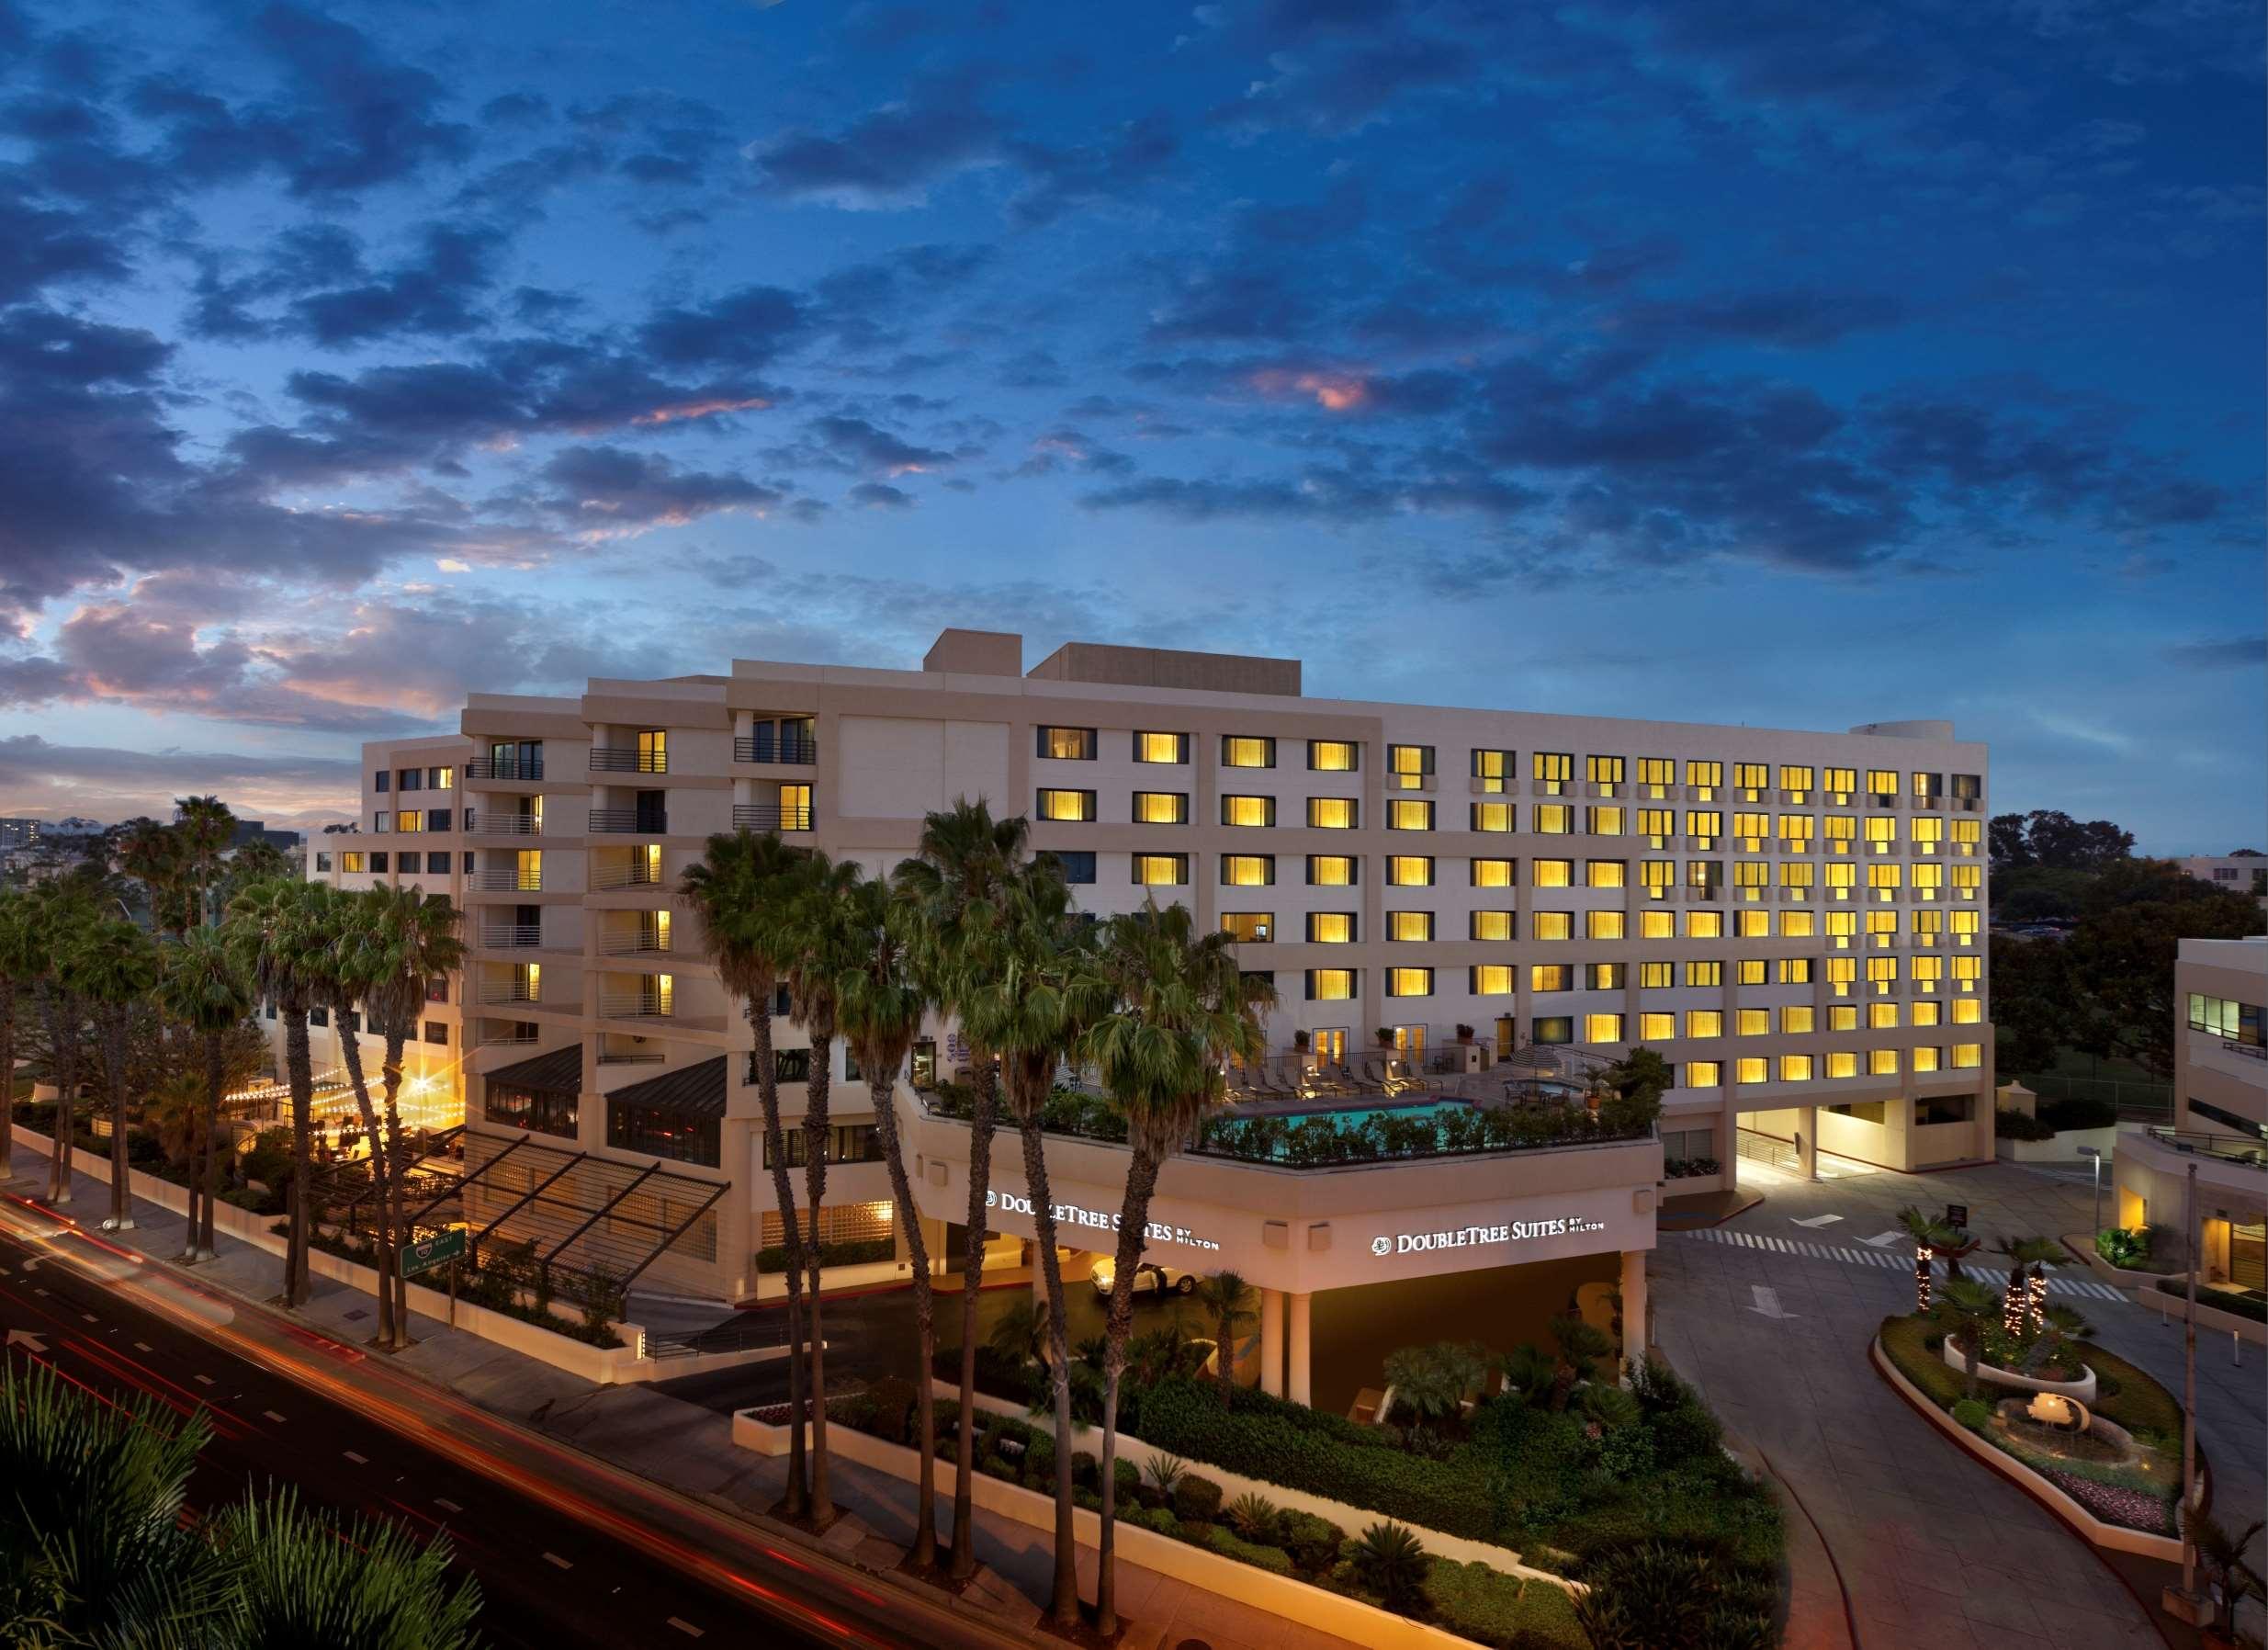 DoubleTree Suites by Hilton Hotel Santa Monica image 1